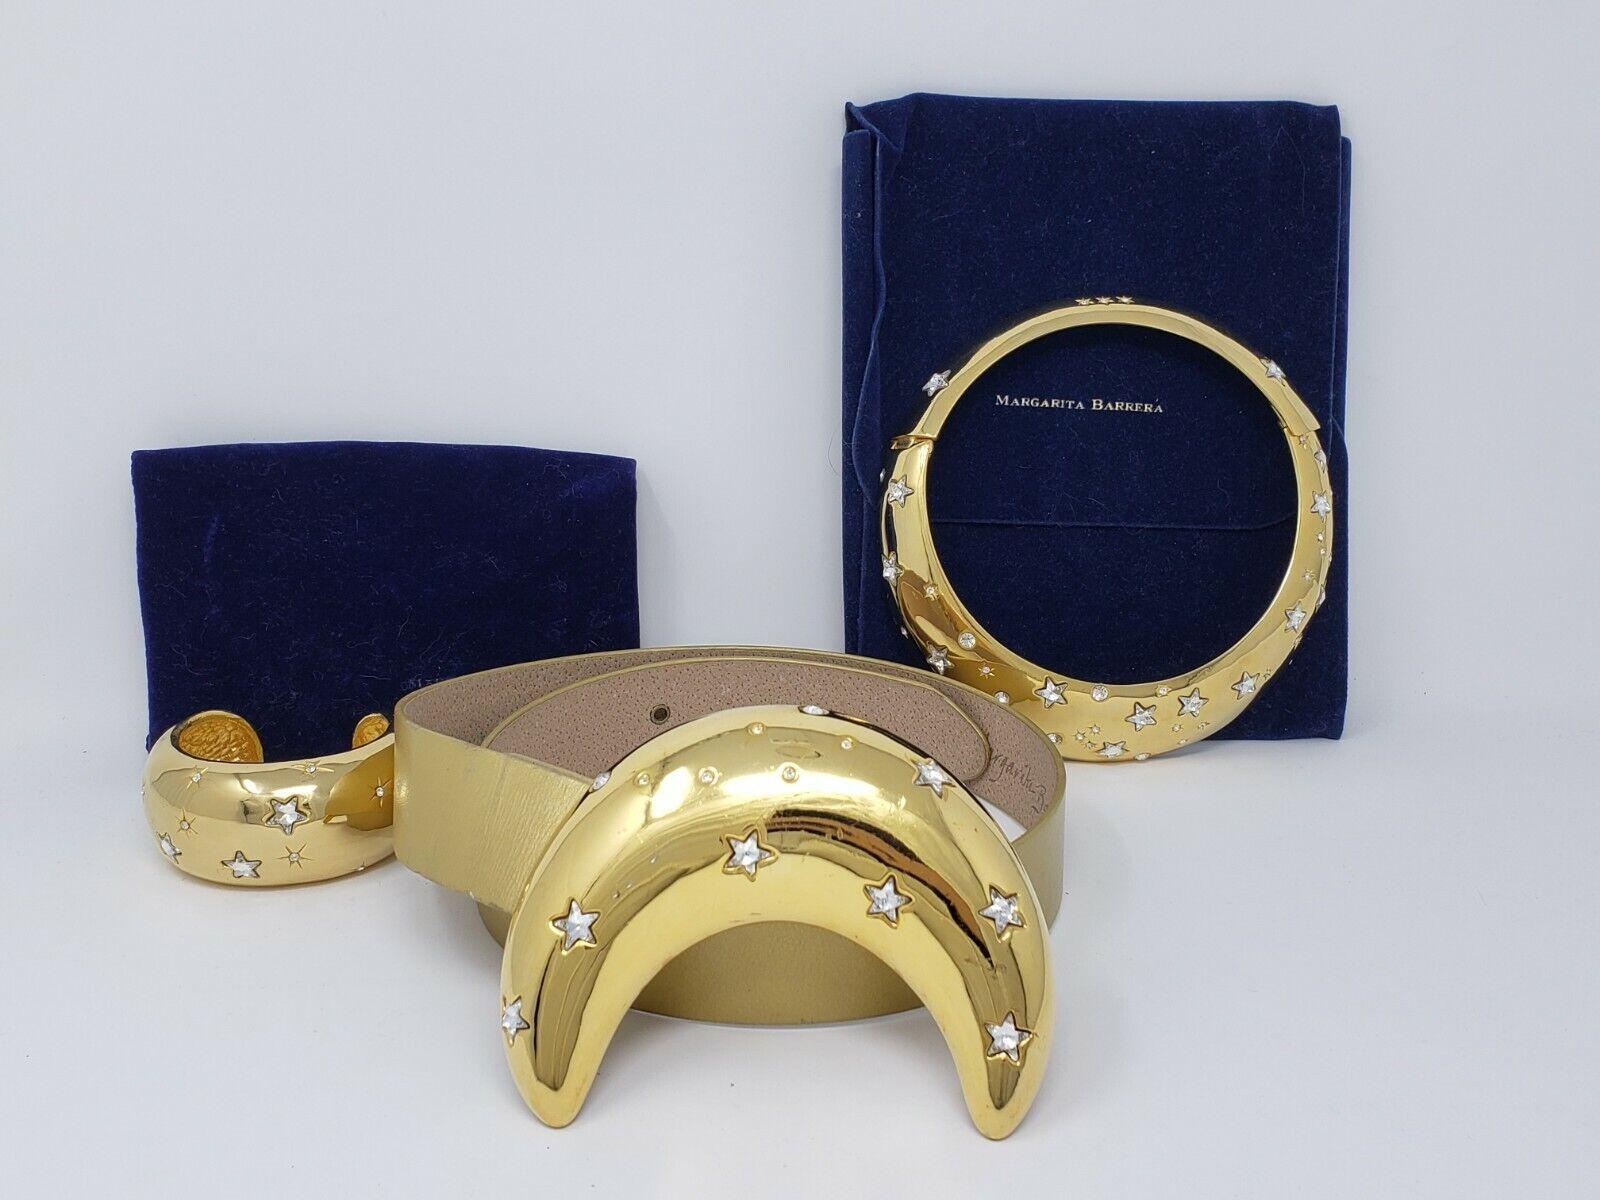 MARGARITA BARRERA Moon & Stars-Gold Plated Buckle, Choker, Bracelet & Belt Set